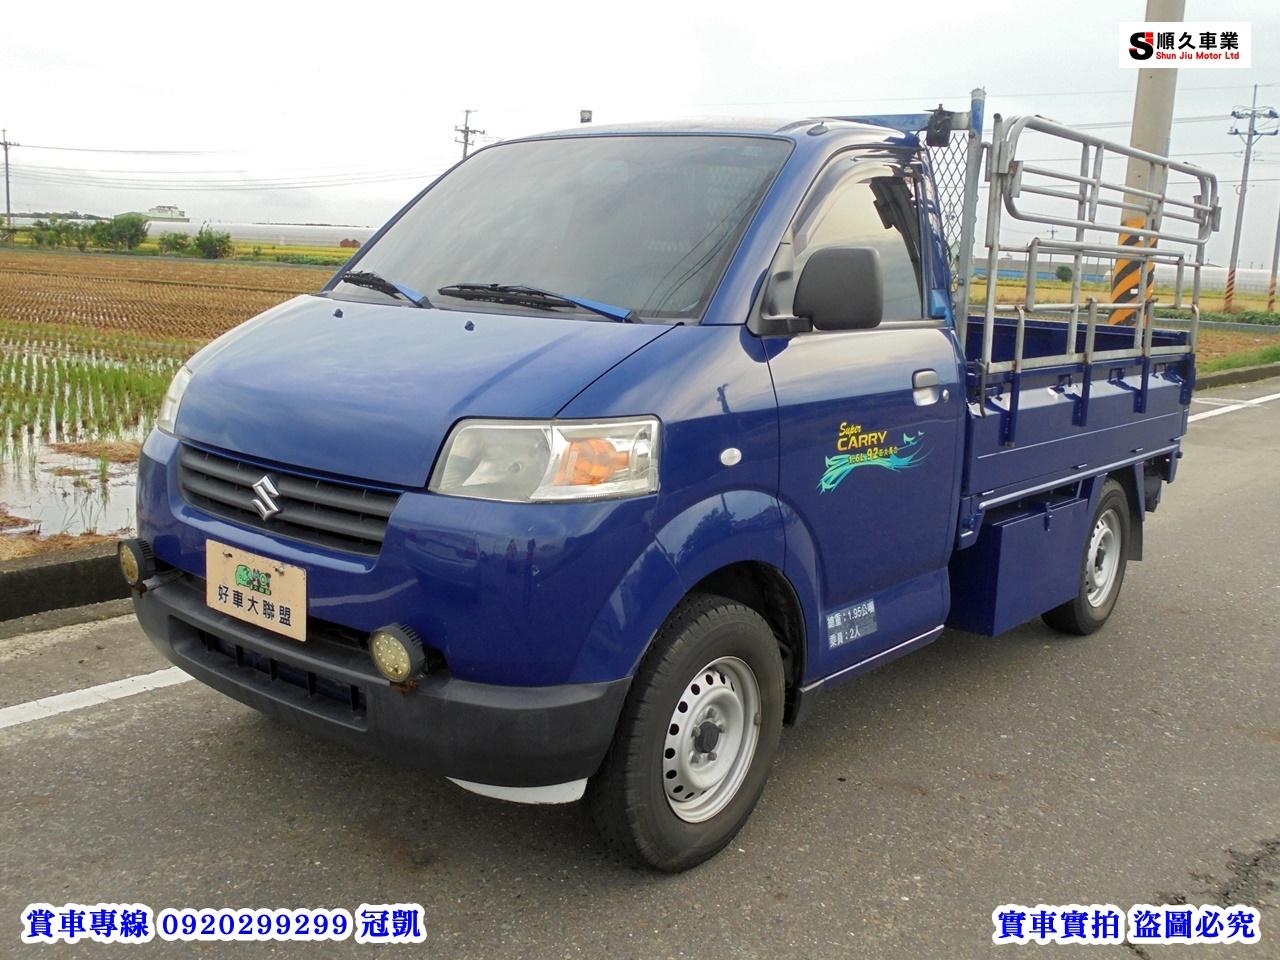 2013 Suzuki Super carry